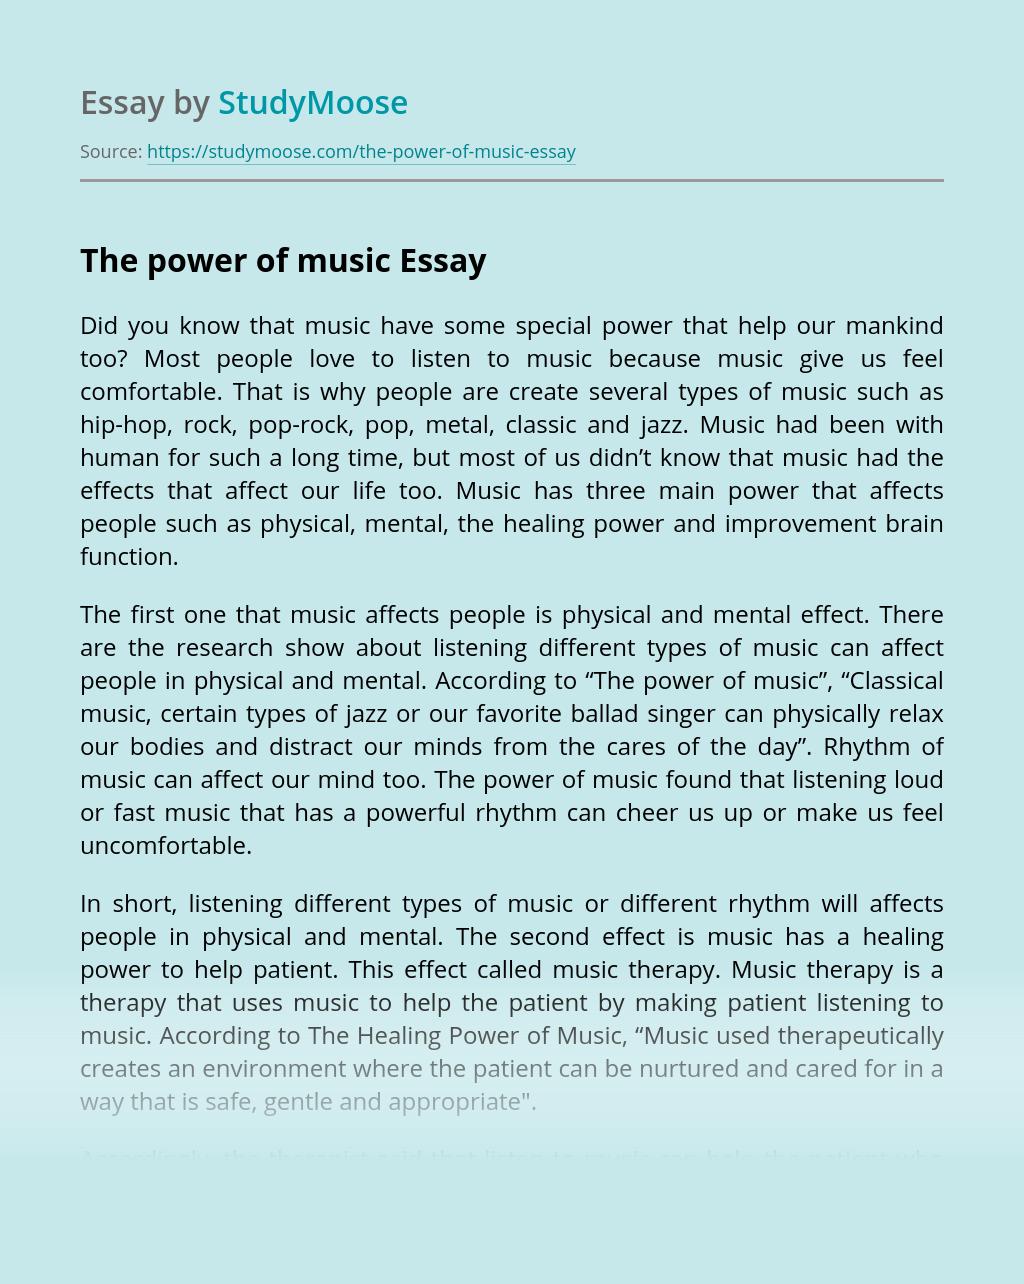 Musics influence essay wang xiaobo essays